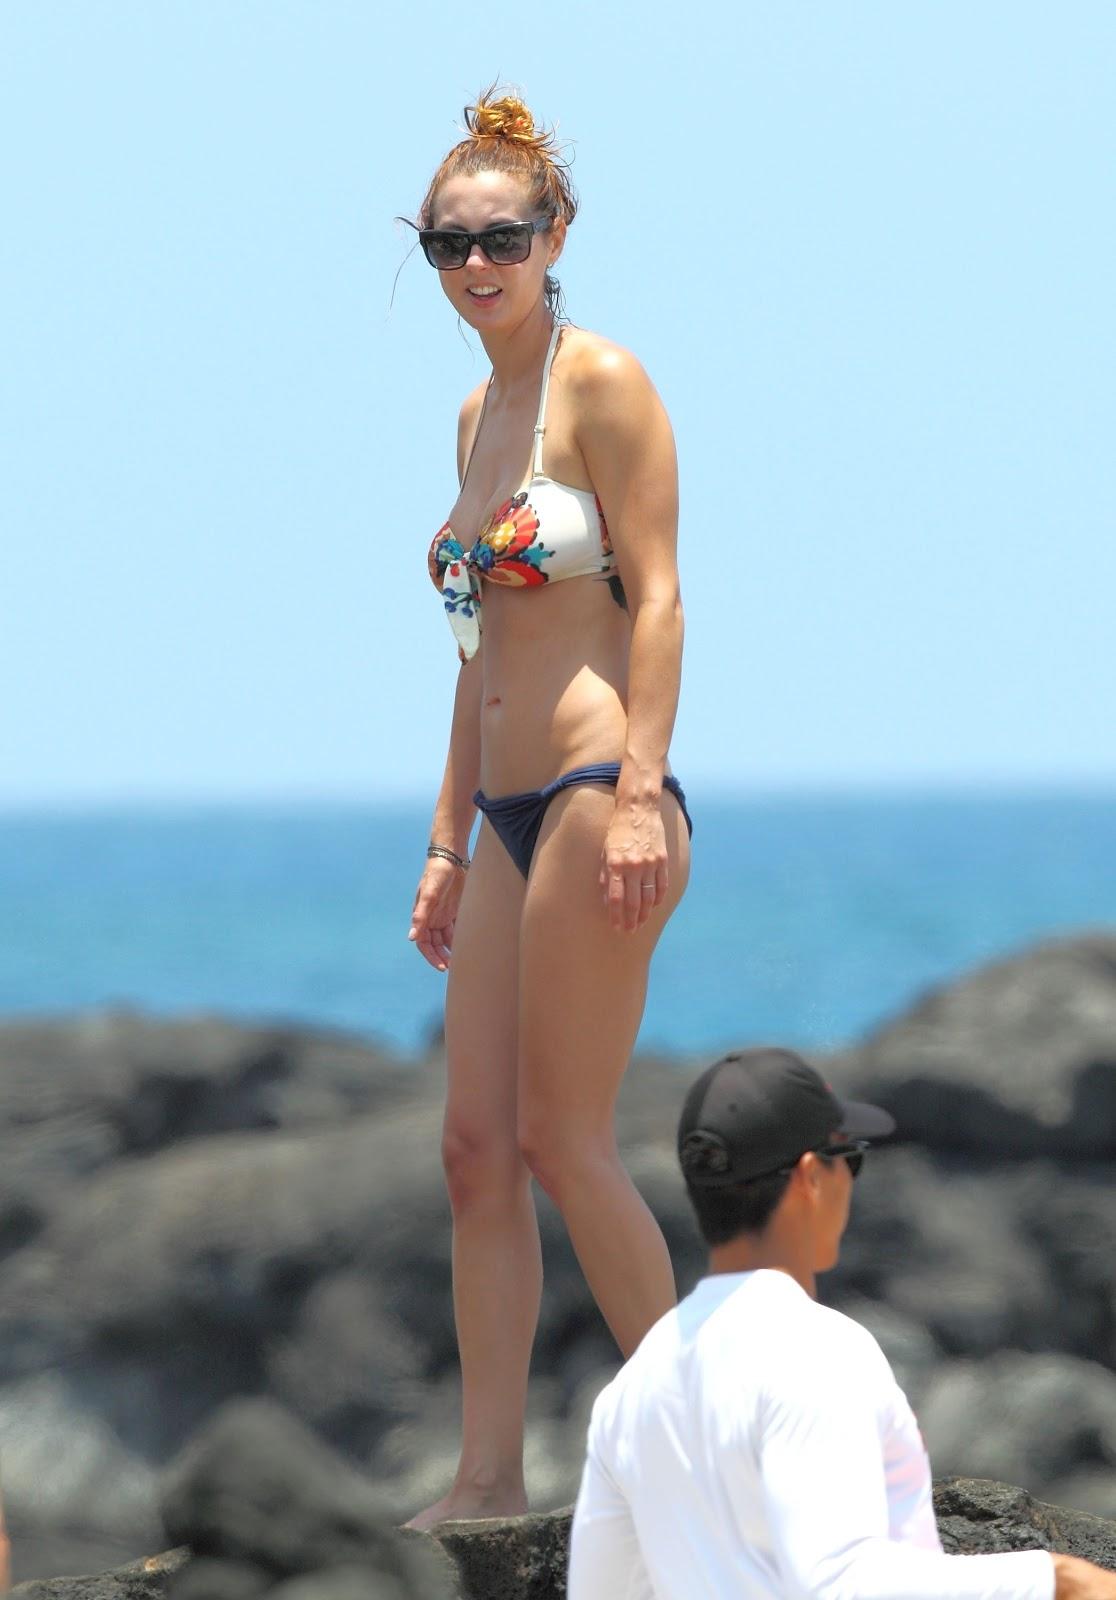 Eva Amurri bikini pictures - Sexy Leg Cross